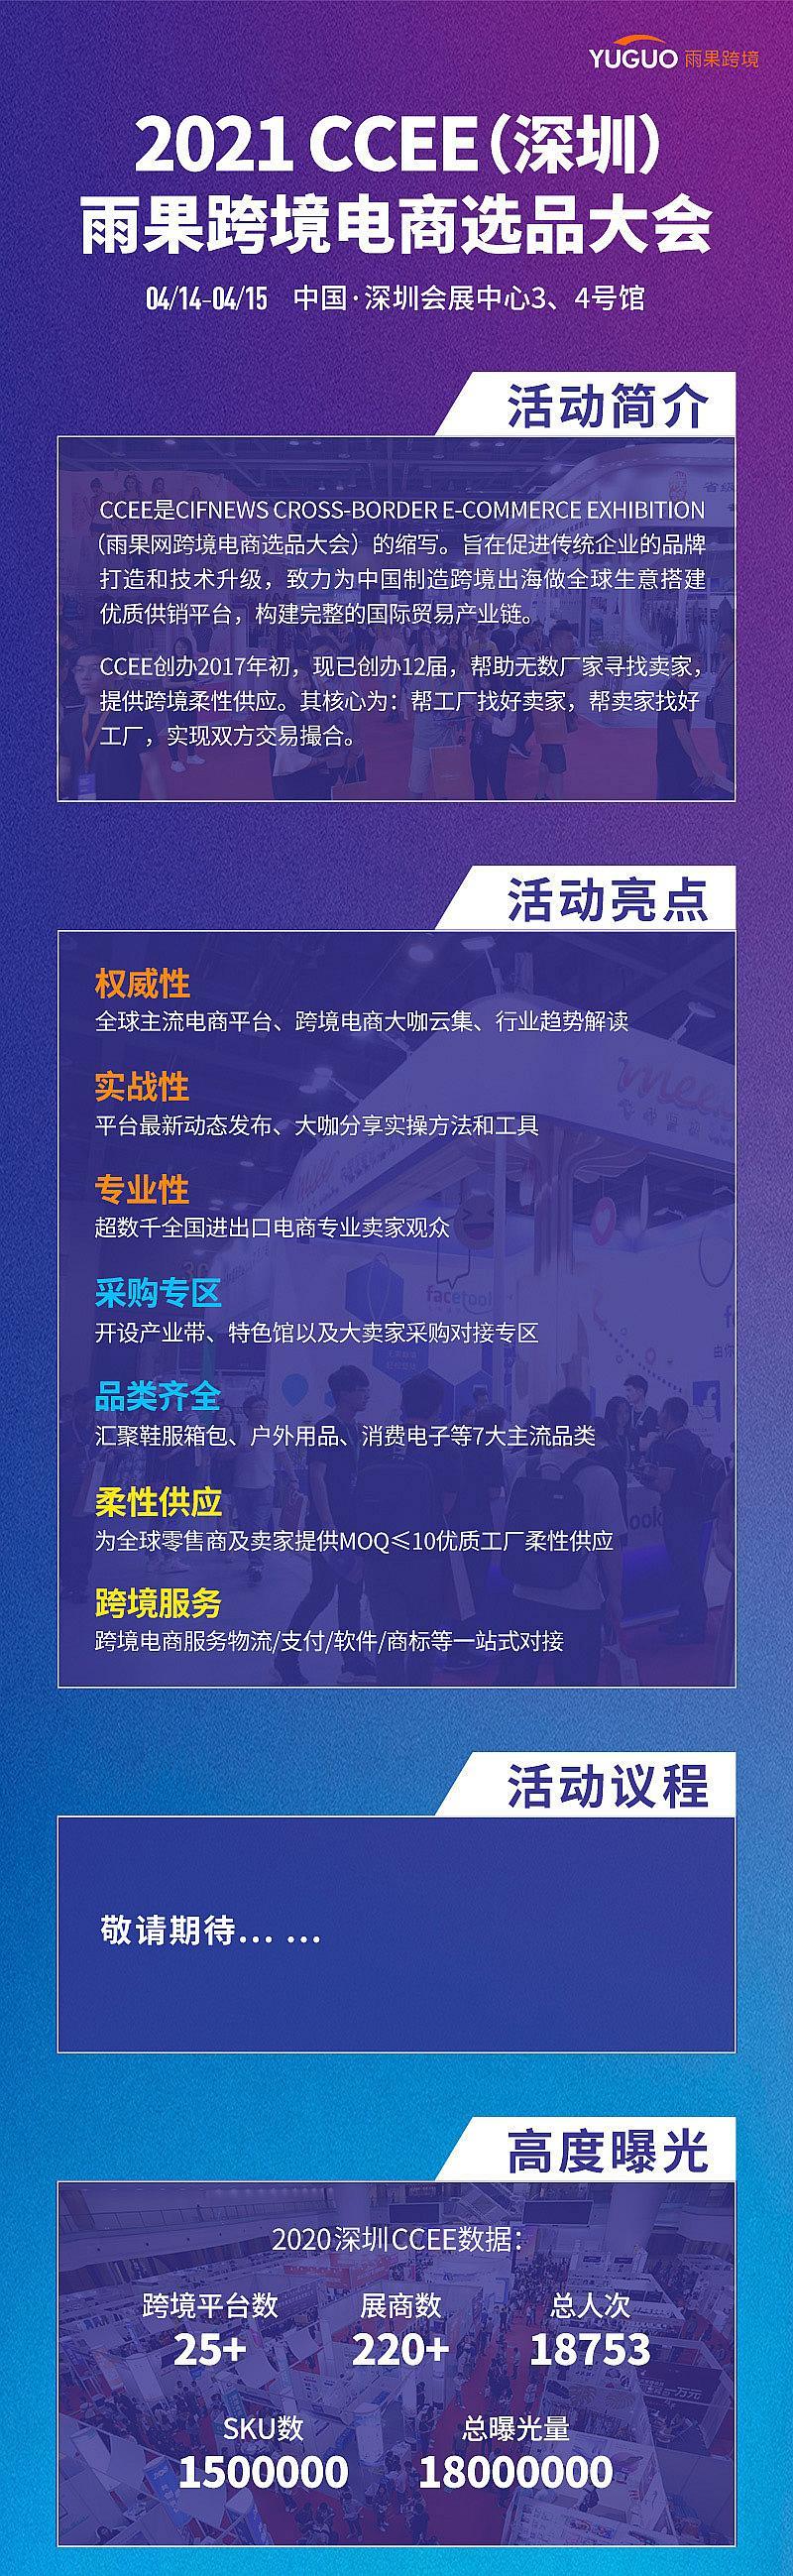 2021 CCEE(深圳)雨果网跨境电商选品大会